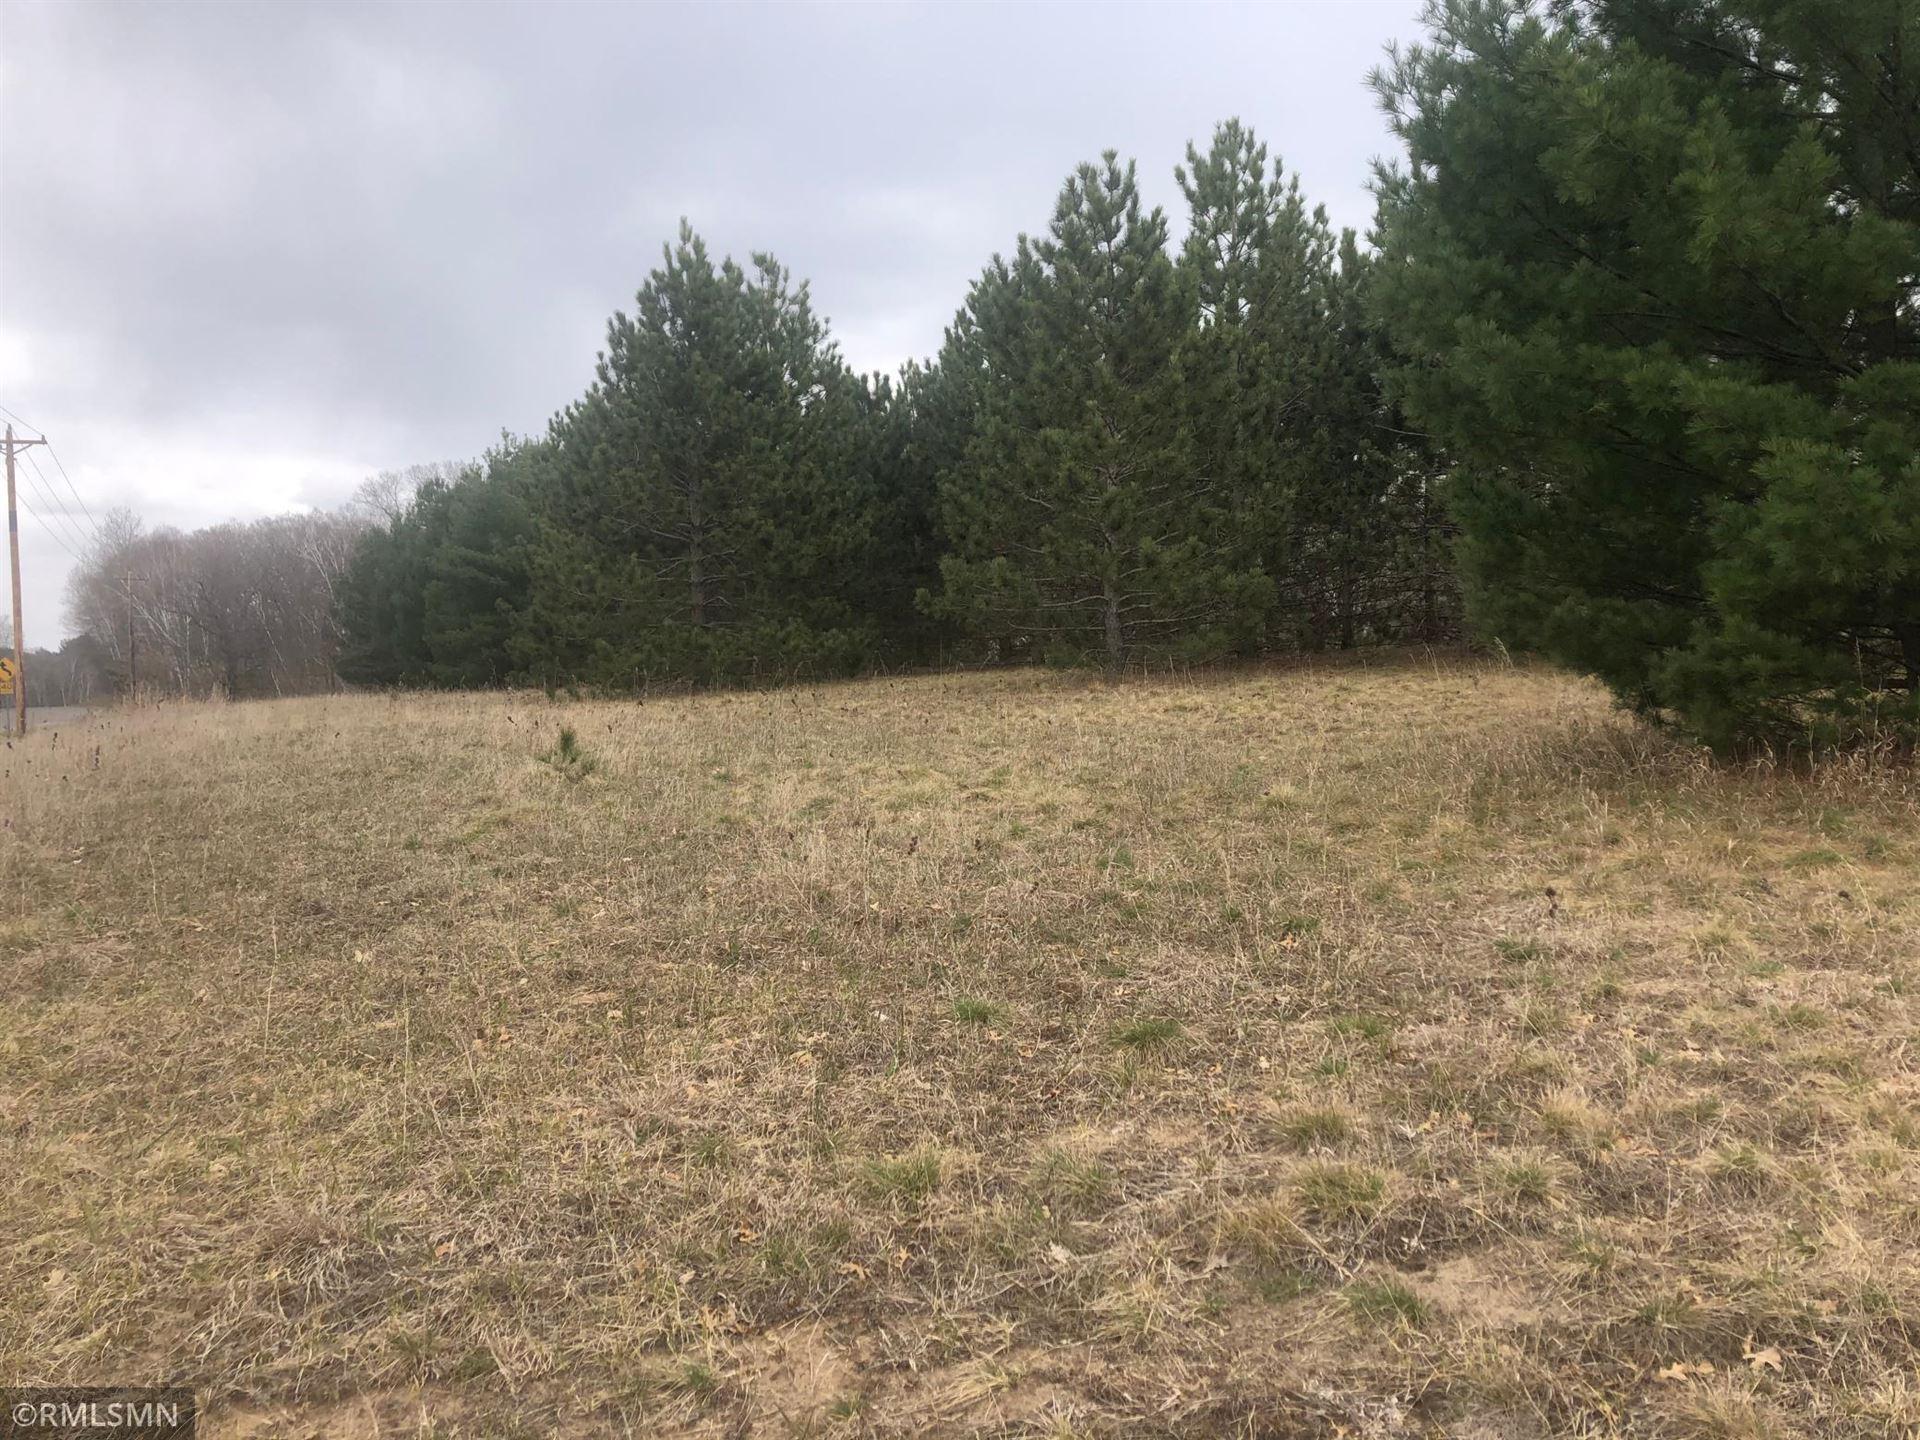 Photo of Lot 6 Typo Creek Drive NE, Linwood Township, MN 55079 (MLS # 5743224)